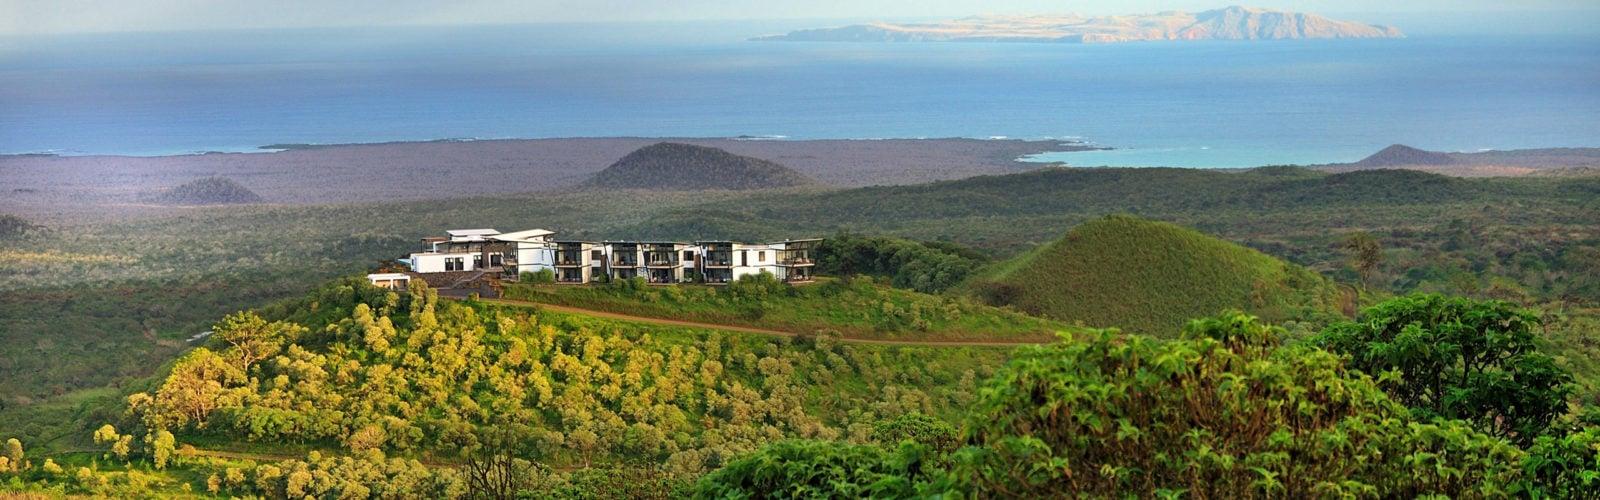 pikaia-lodge-galapagos-islands-ecuador